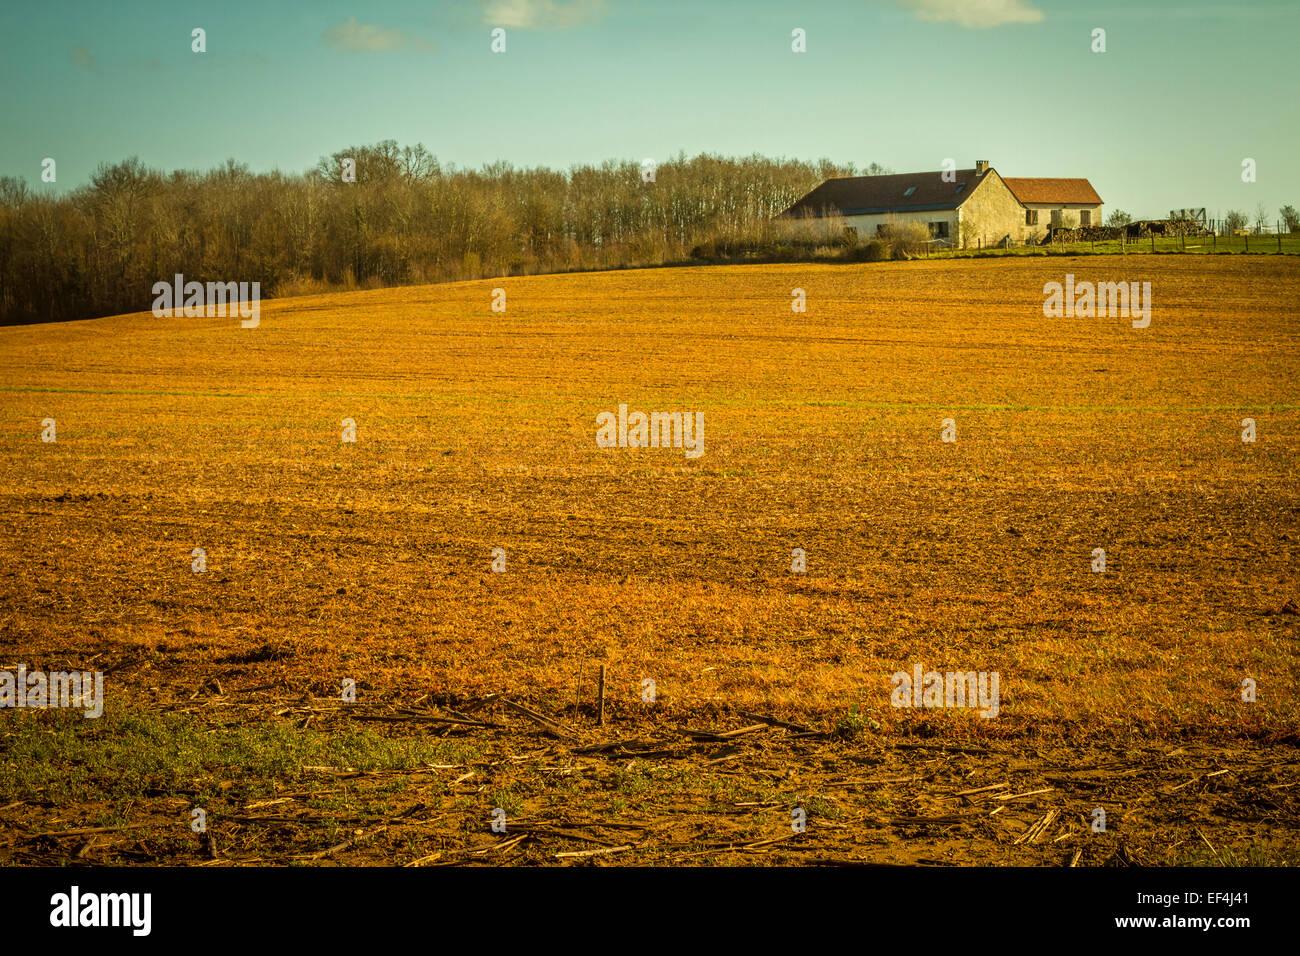 Farm house on a field. - Stock Image